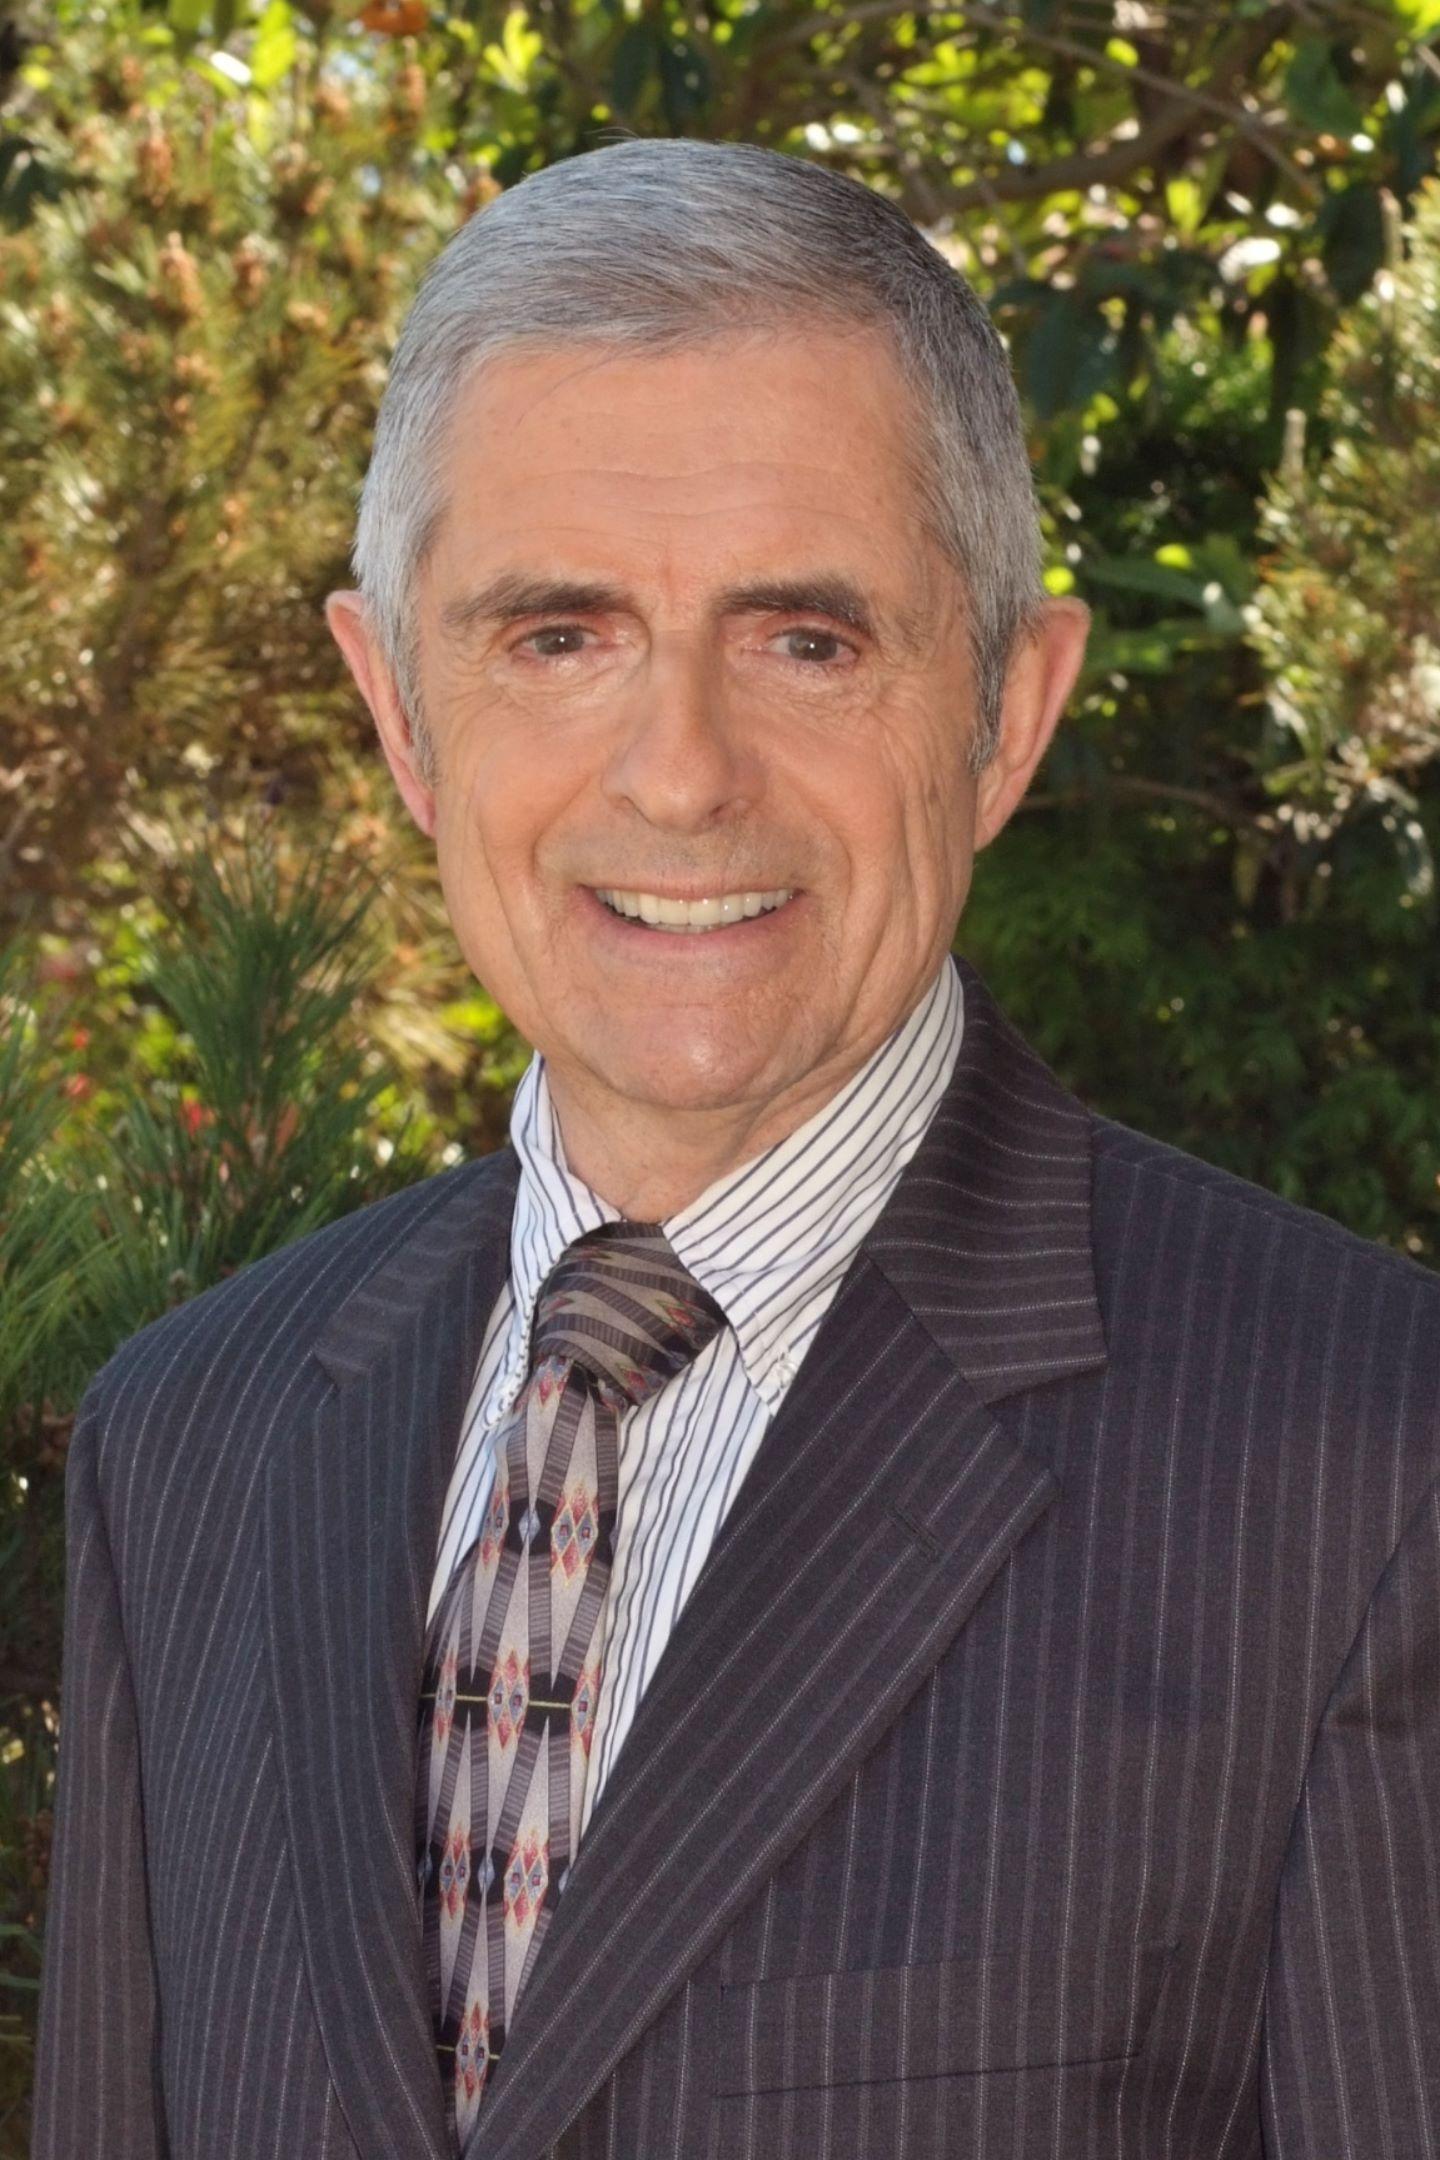 Robert Smith, Real Estate Agent - Yorba Linda, CA